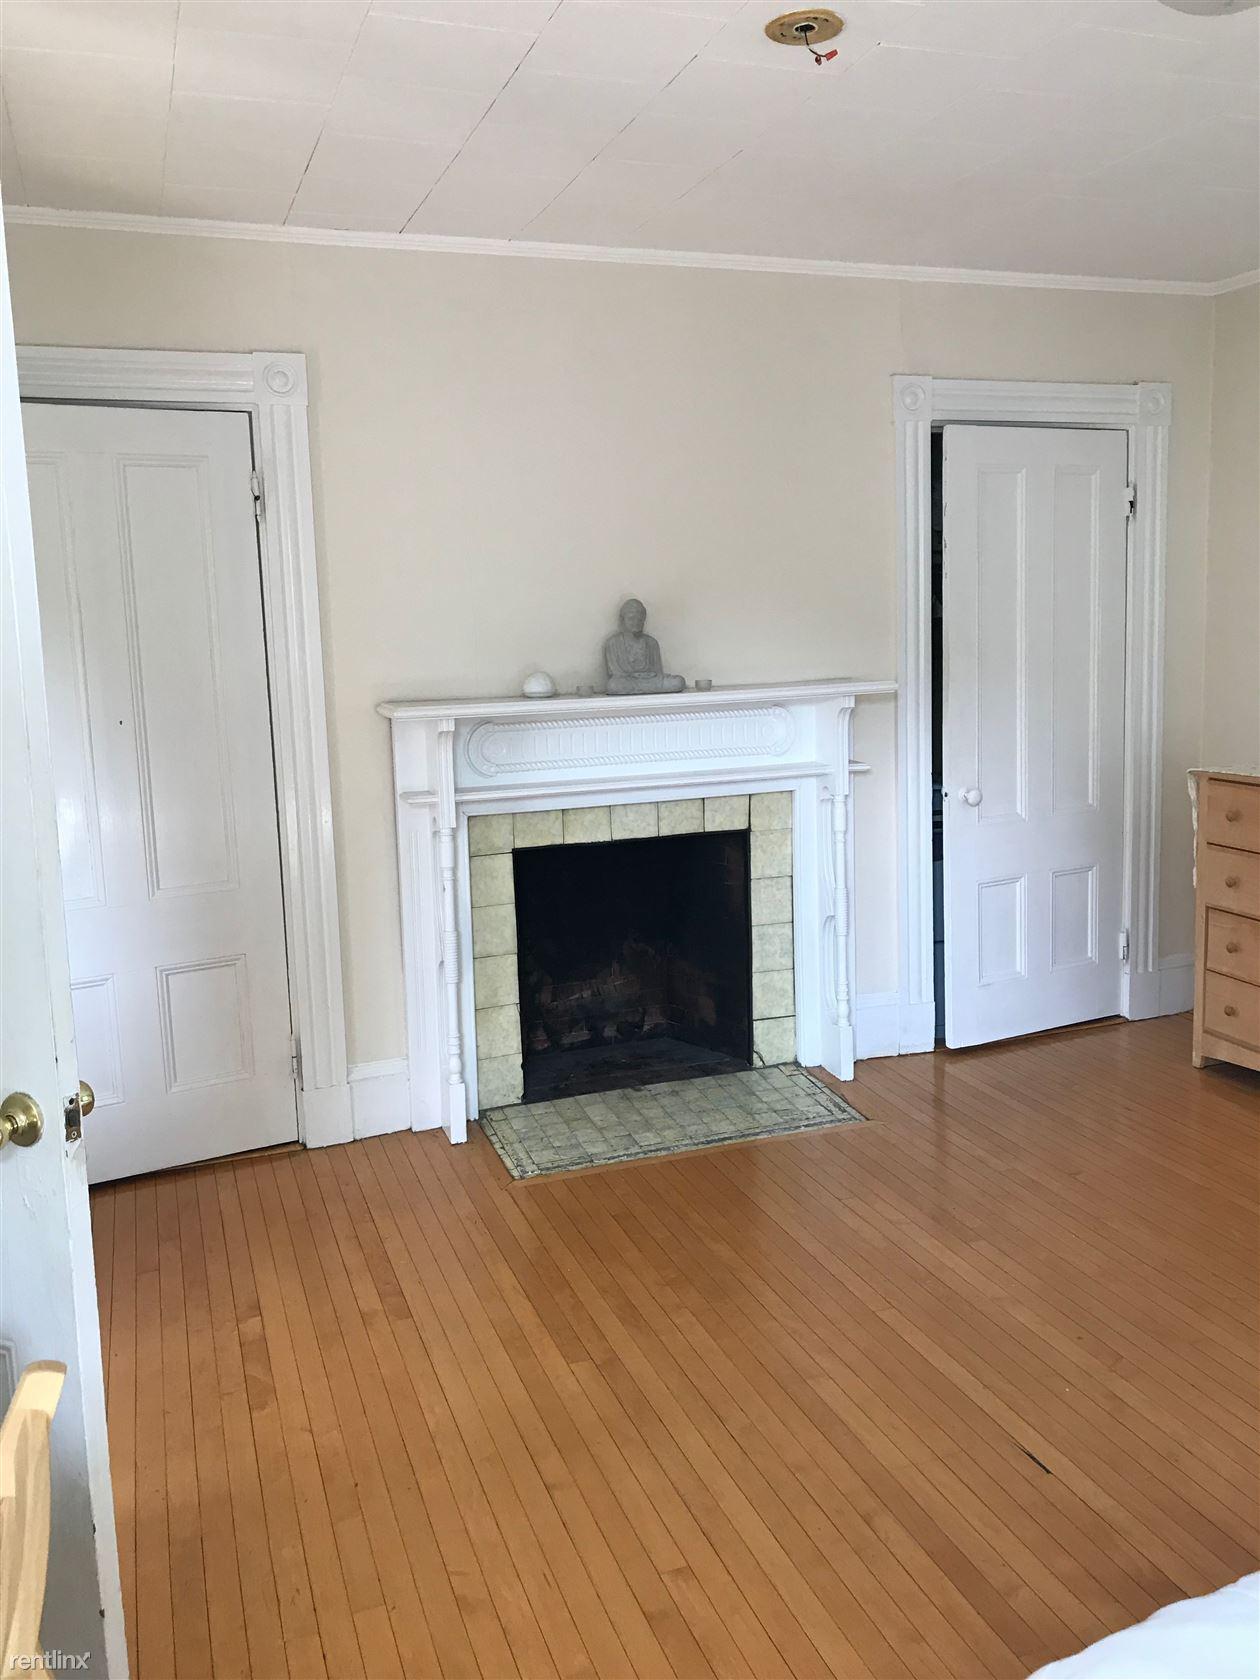 14 Abbott St Apt 2F, Wellesley, MA - $2,300